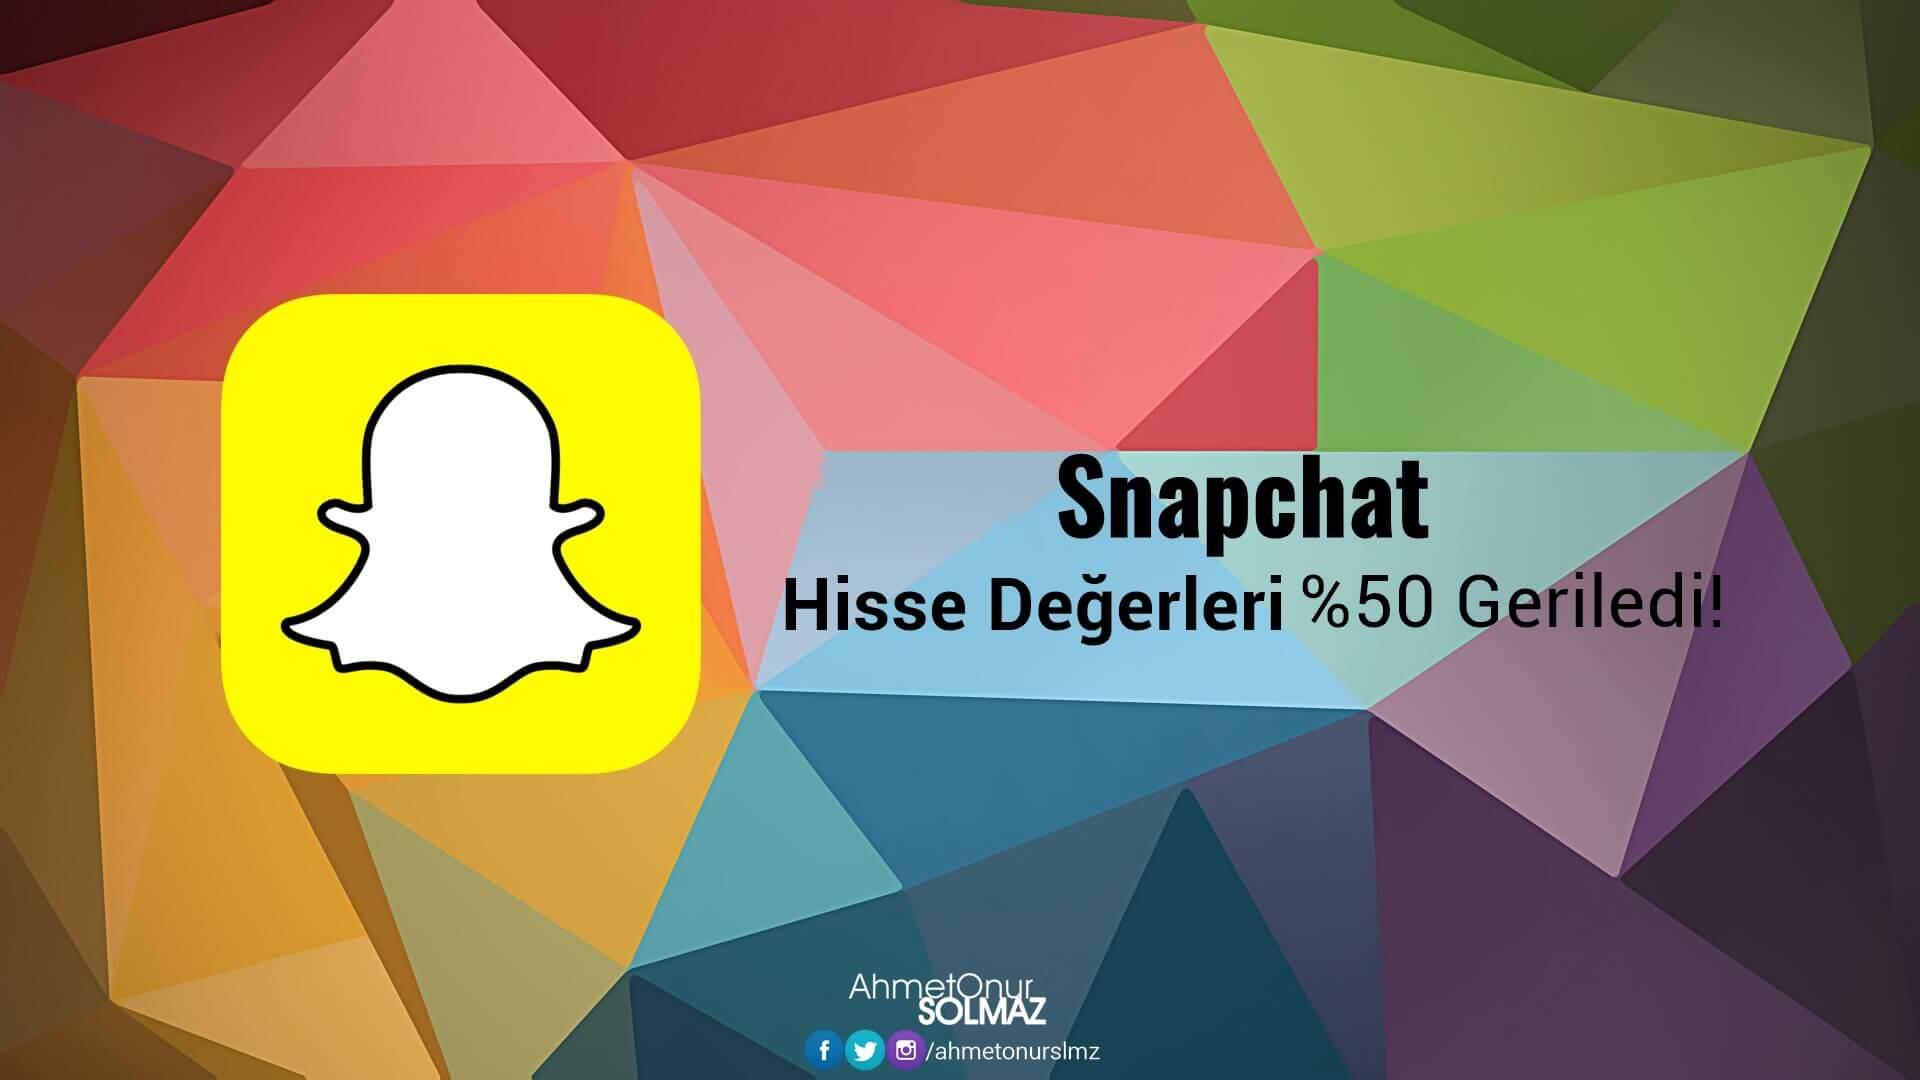 Snapchat Hisse Değerleri